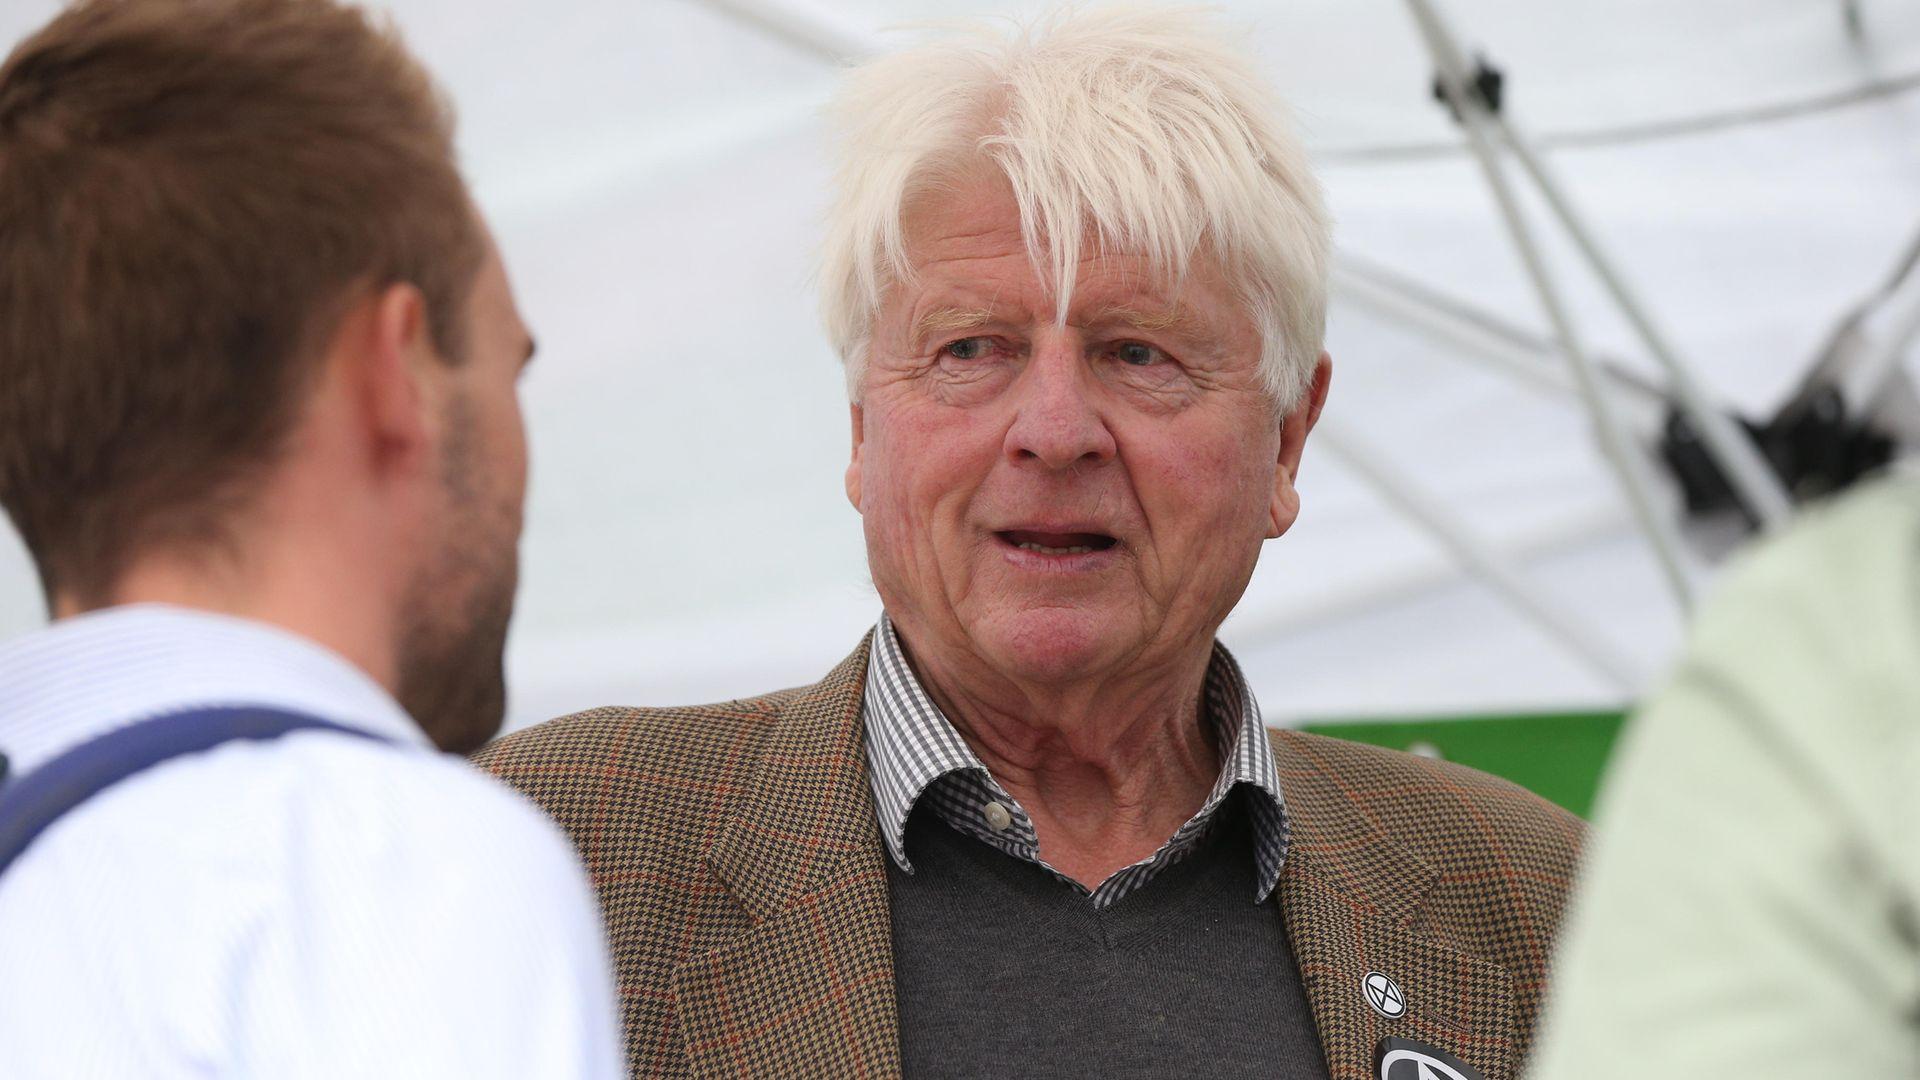 Stanley Johnson, father of Prime Minister, Boris Johnson - Credit: PA